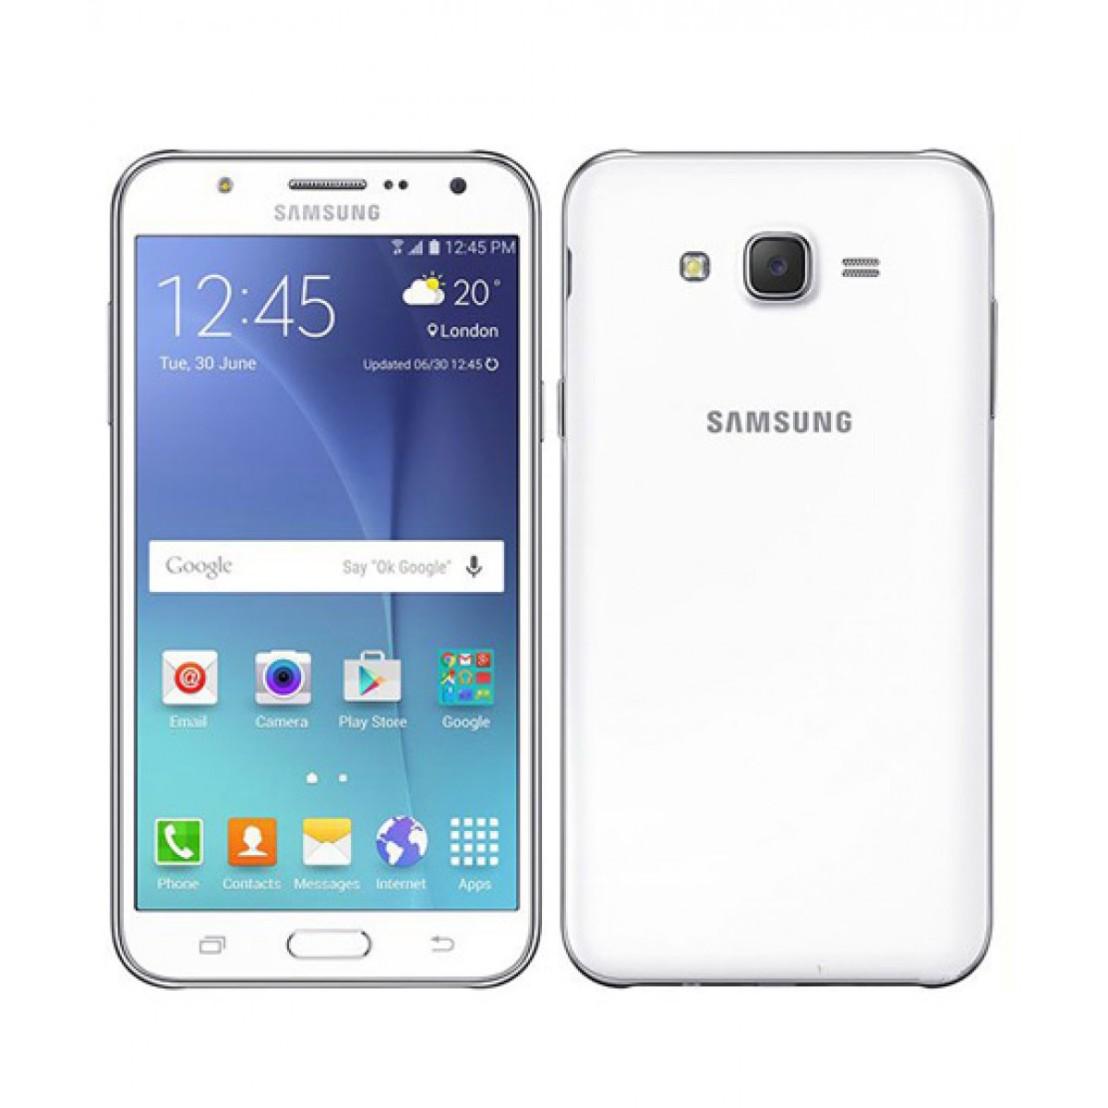 samsung_galaxy_j7_4g_dual_sim_white_j700fd__3